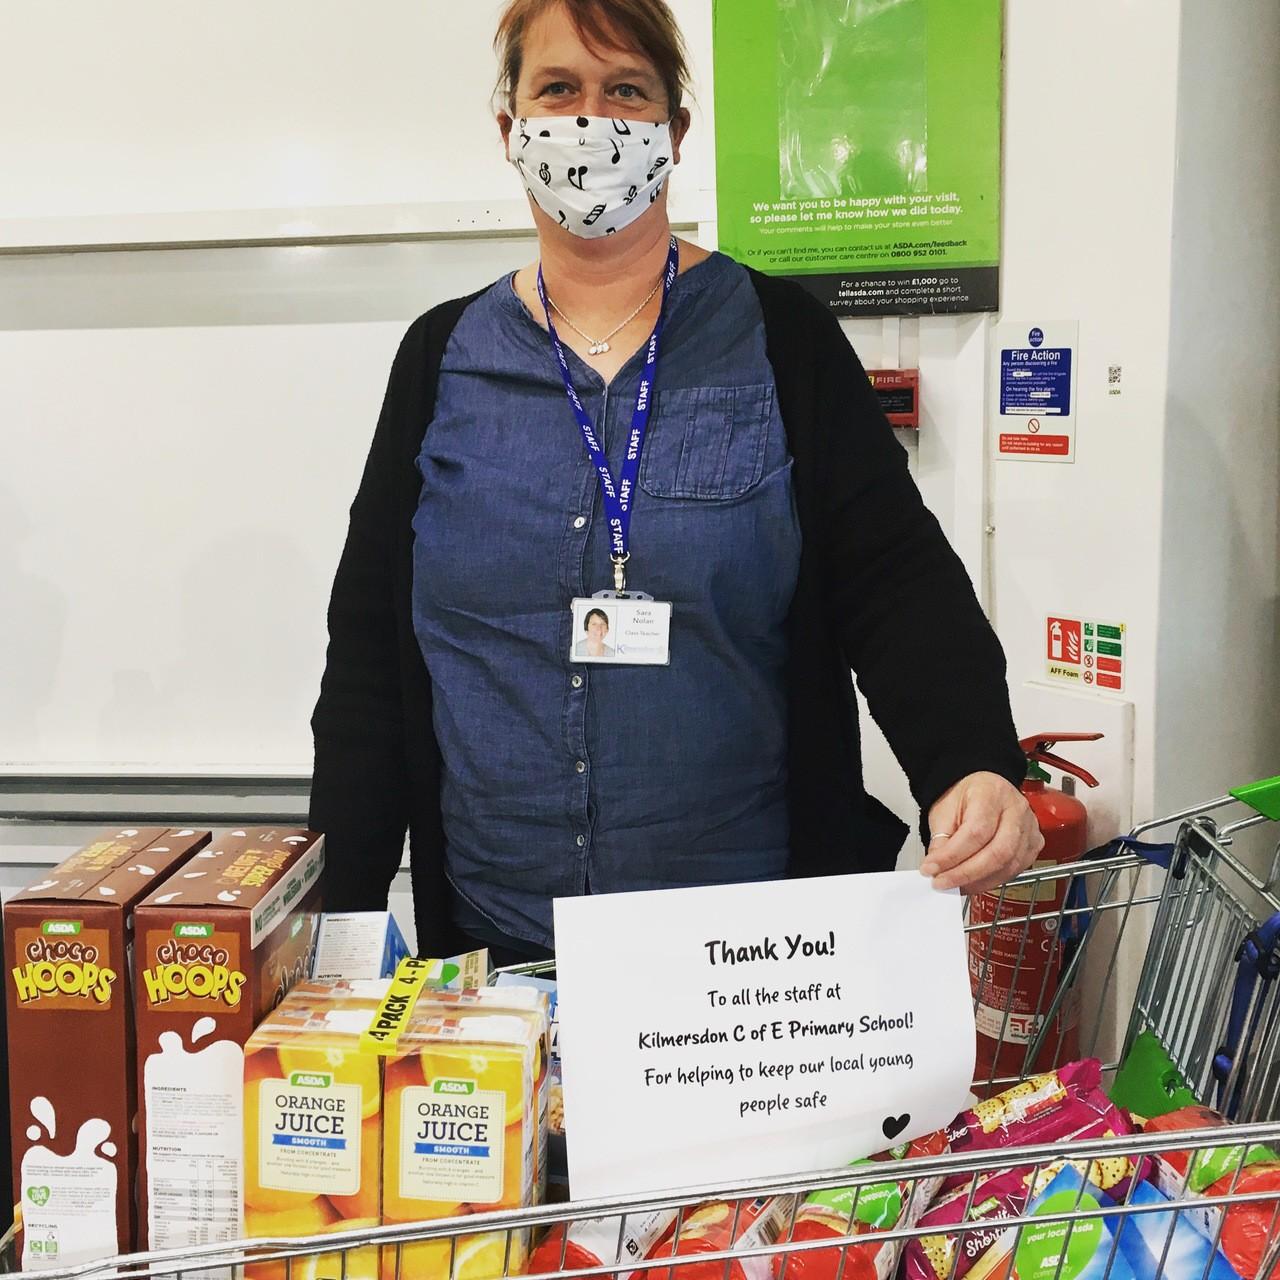 Kilmersdon CofE Primary School | Asda Frome